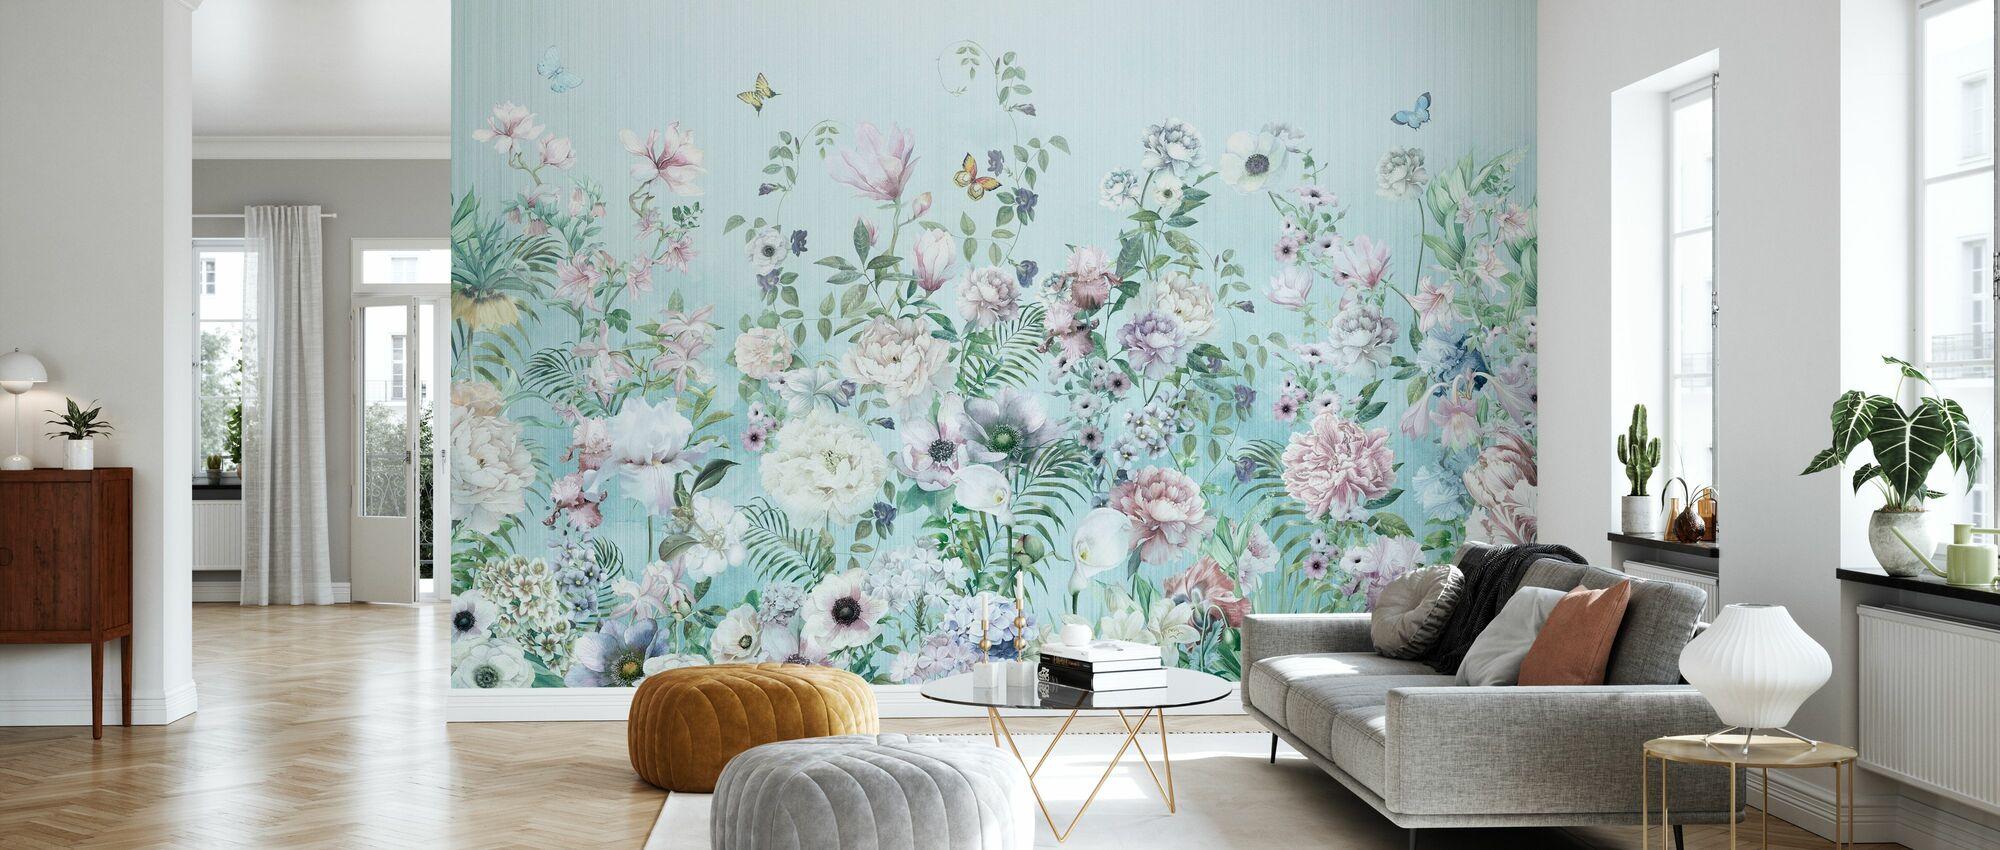 Blooming Floral - Wallpaper - Living Room